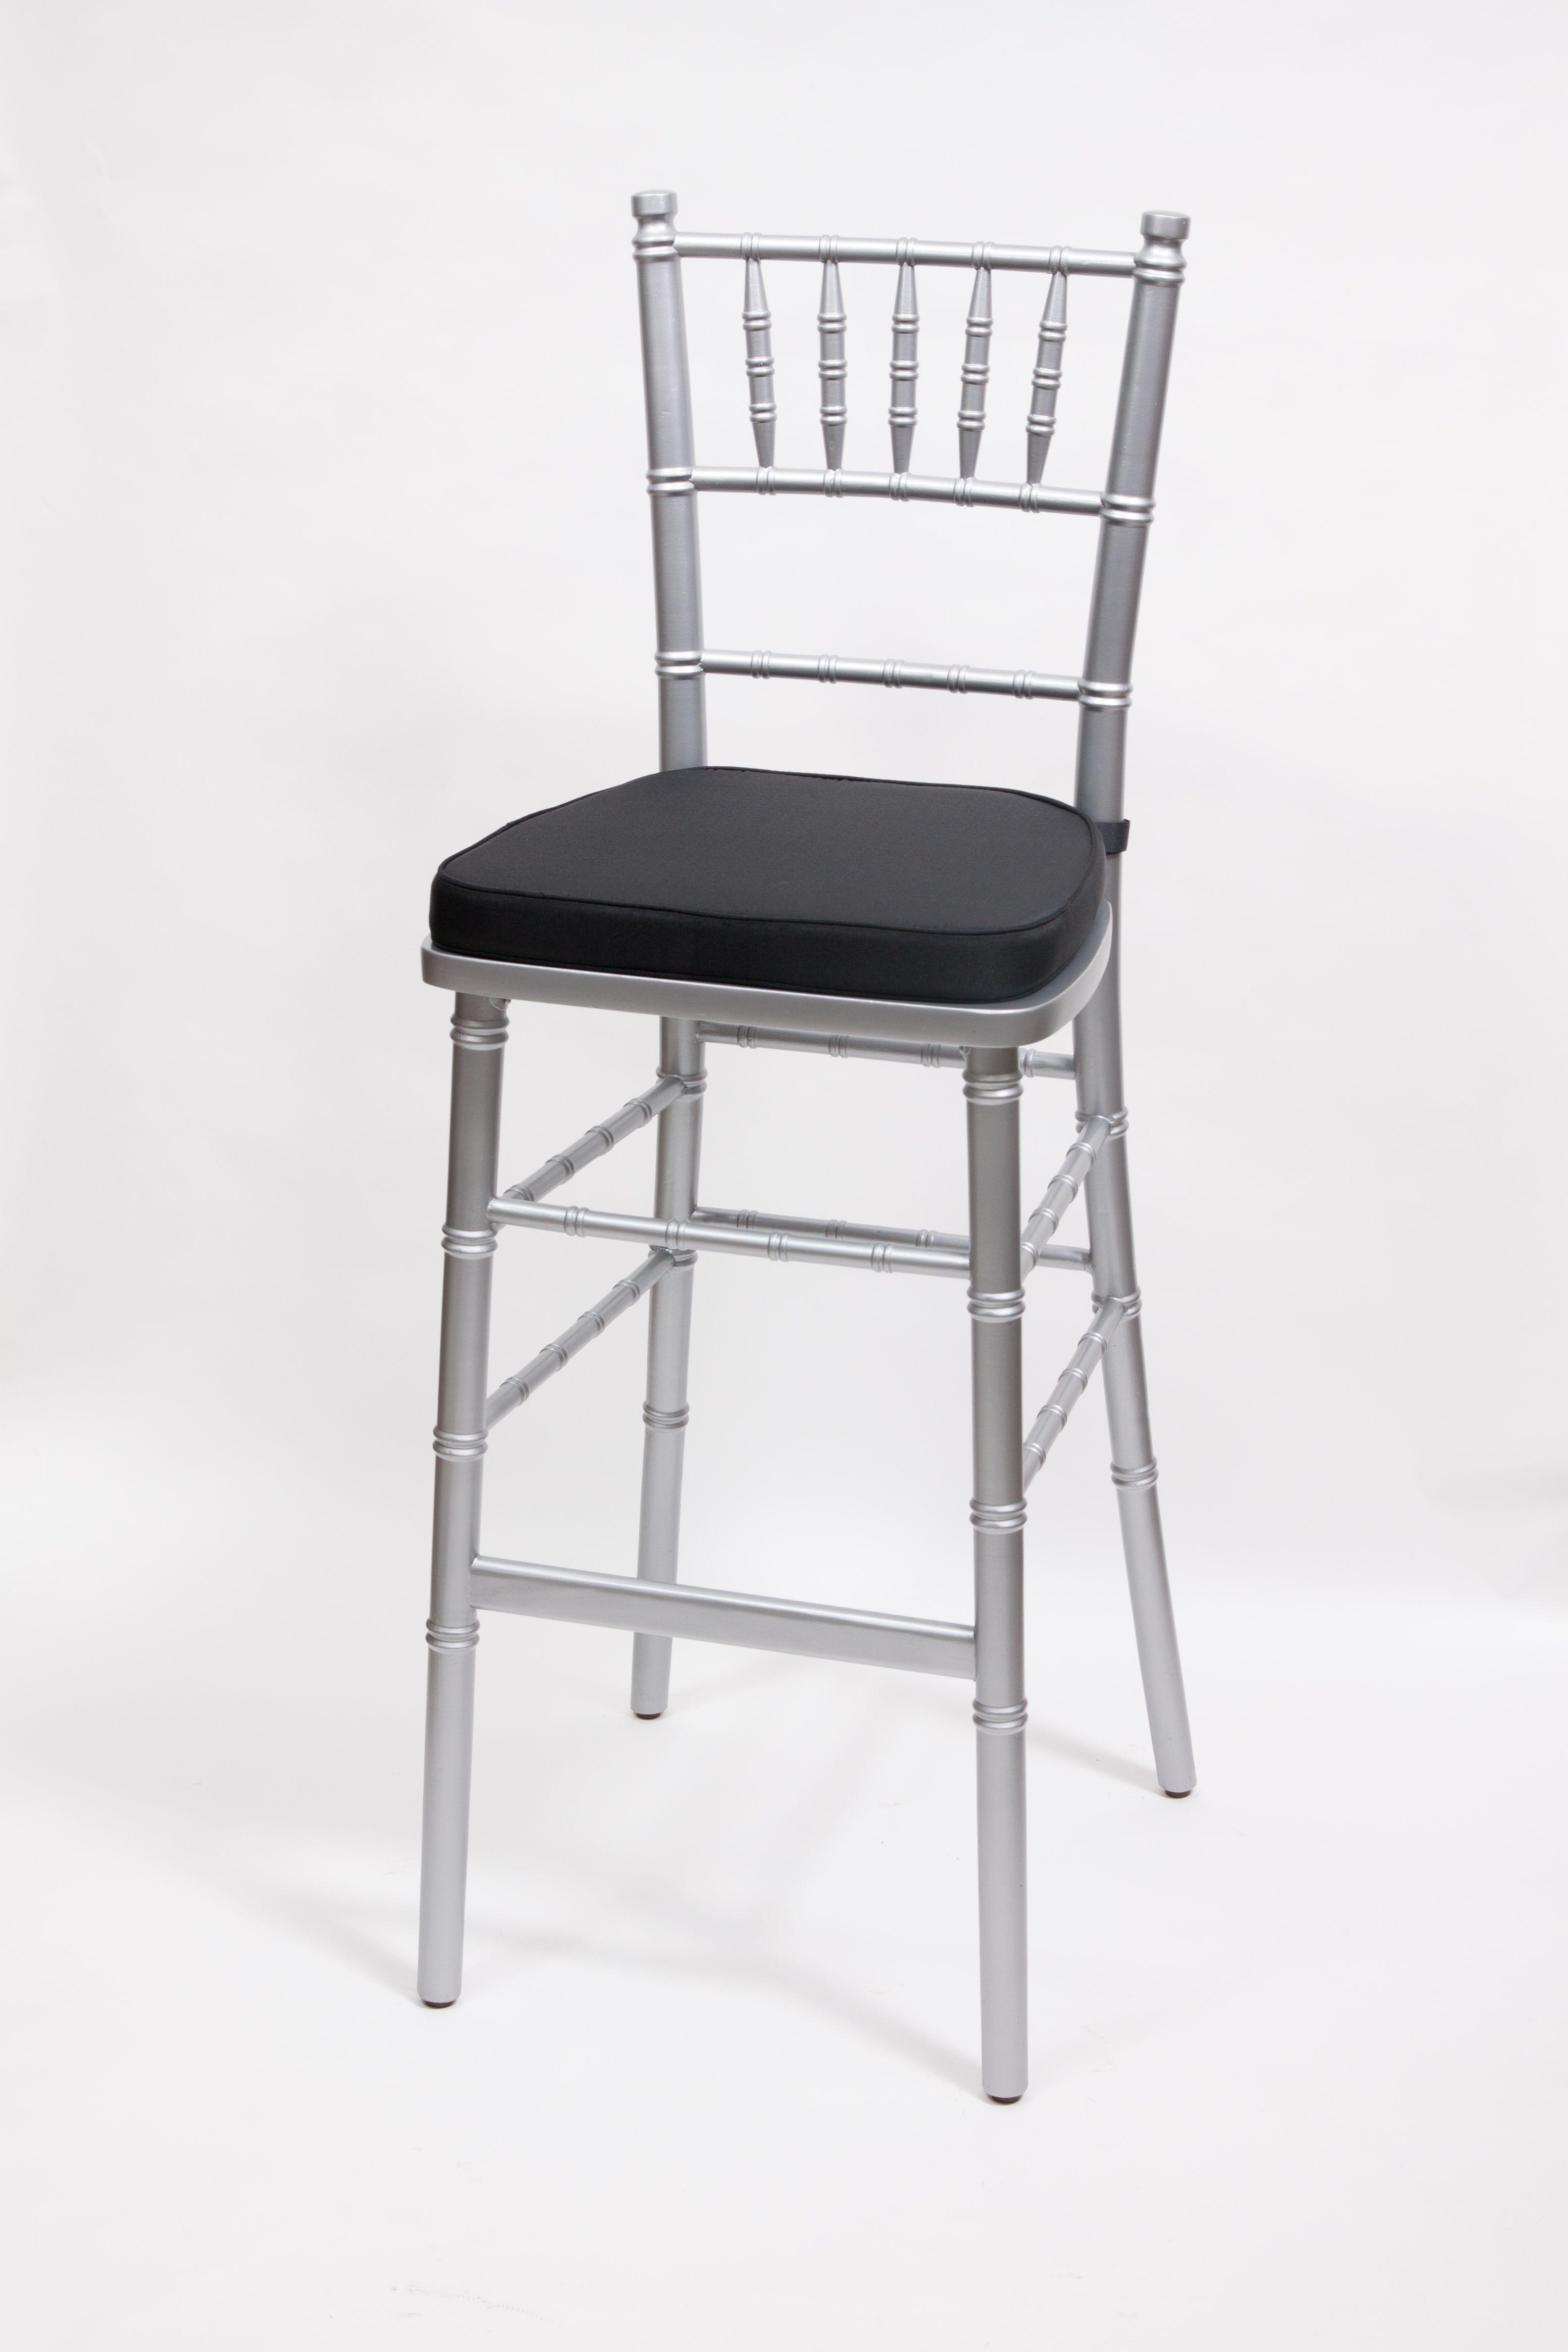 Silver Wooden Chiavari Chair By Vision Furniture Bare Bones